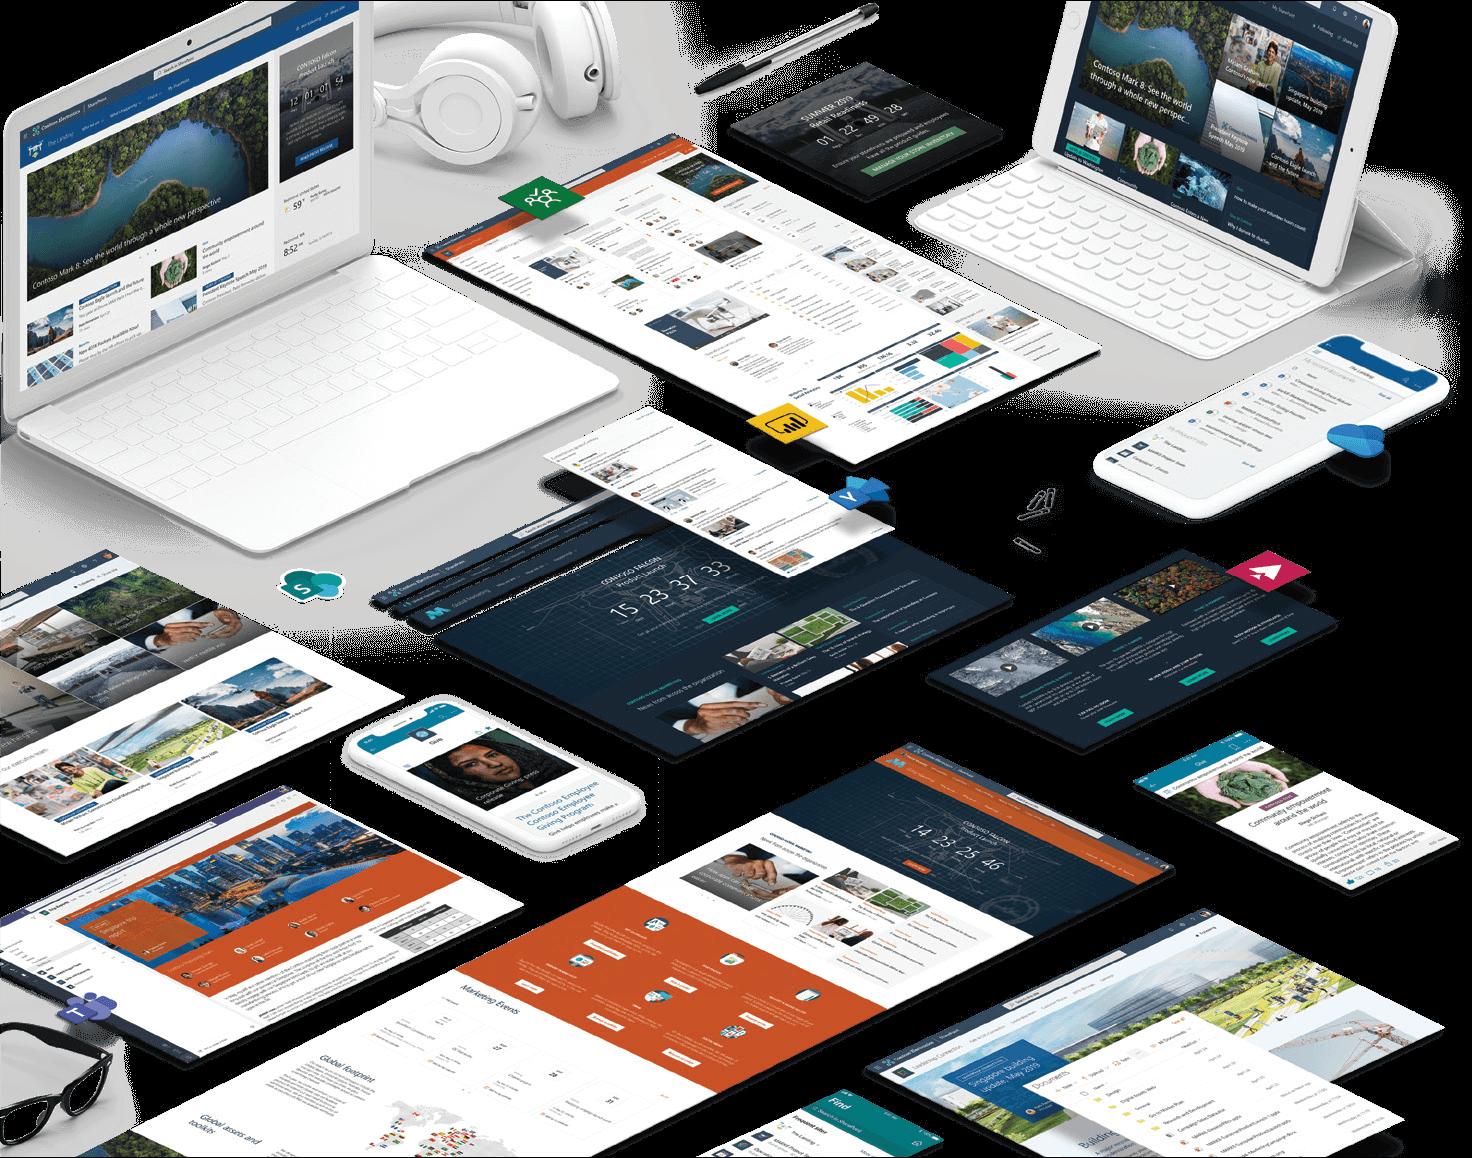 SharePoint vizualy obrazoviek